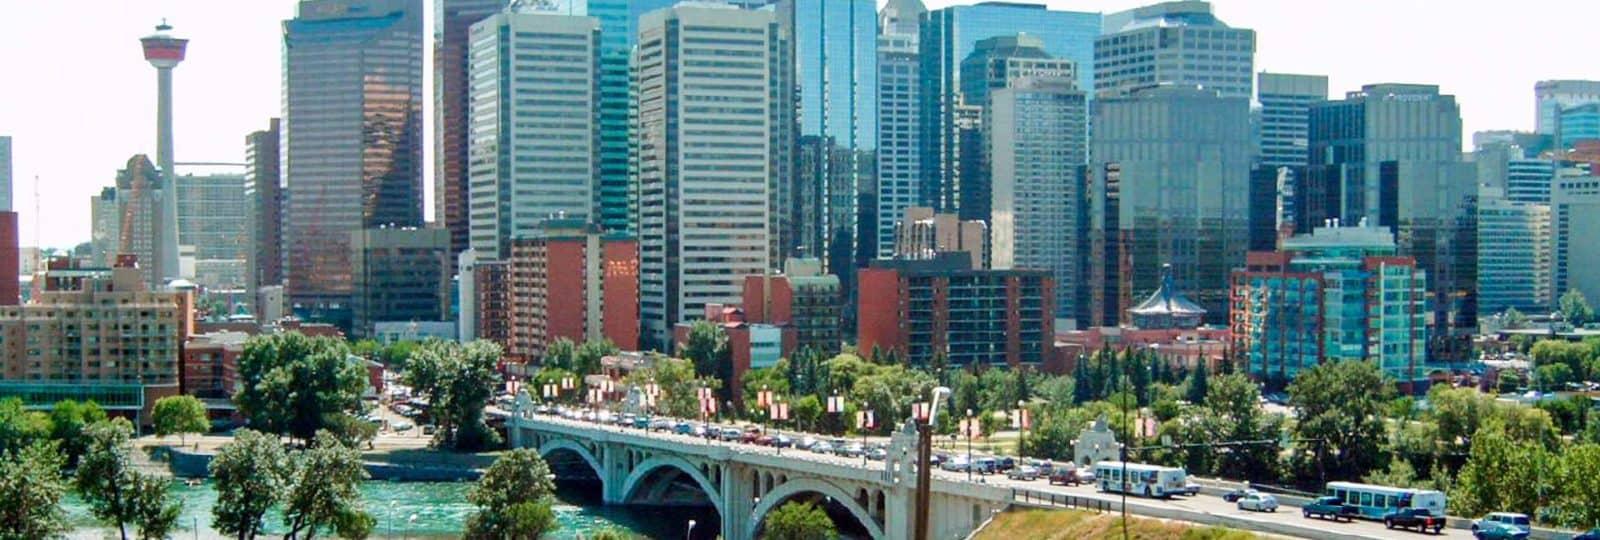 Stadtrundgang in Calgary mit Manuel